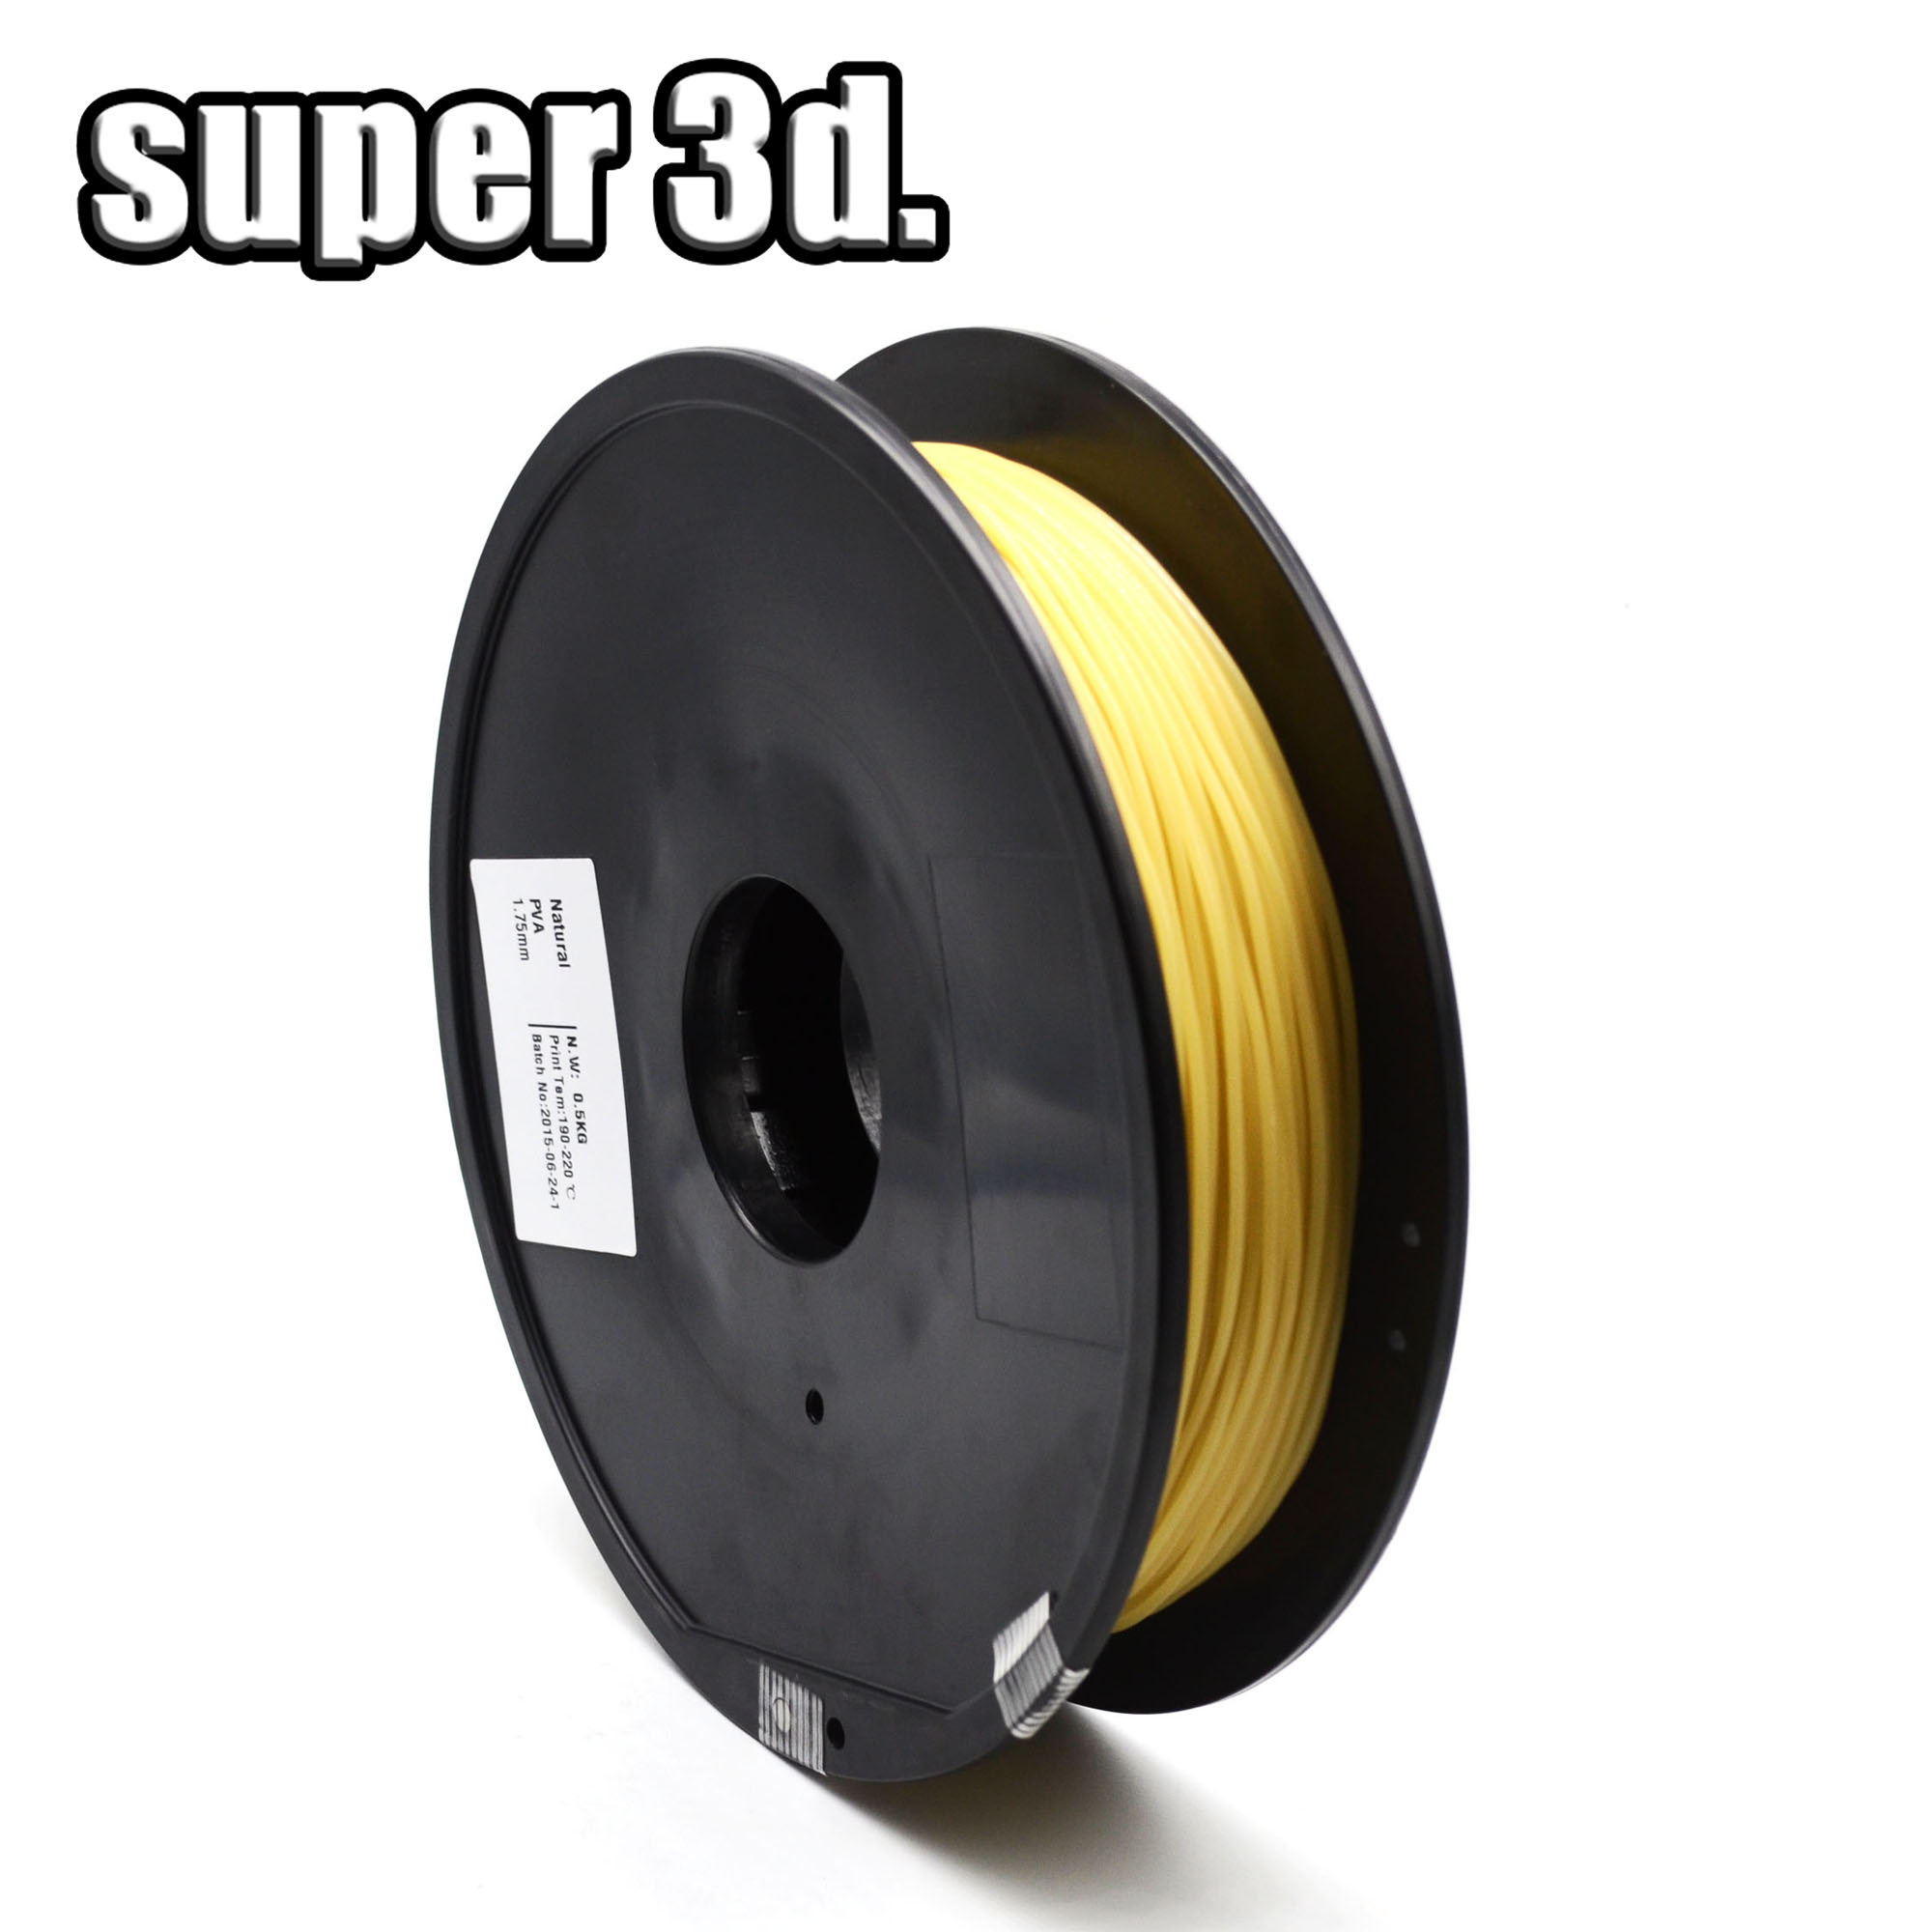 3D プリンタ水溶性フィラメント 1.75 ミリメートルプラスチックハンドル 0.5 キロ PVA ABS PLA PA ヒップ印刷 impressora 3D プリンタ  グループ上の パソコン & オフィス からの 3Dプリンタ造形材料 の中 1